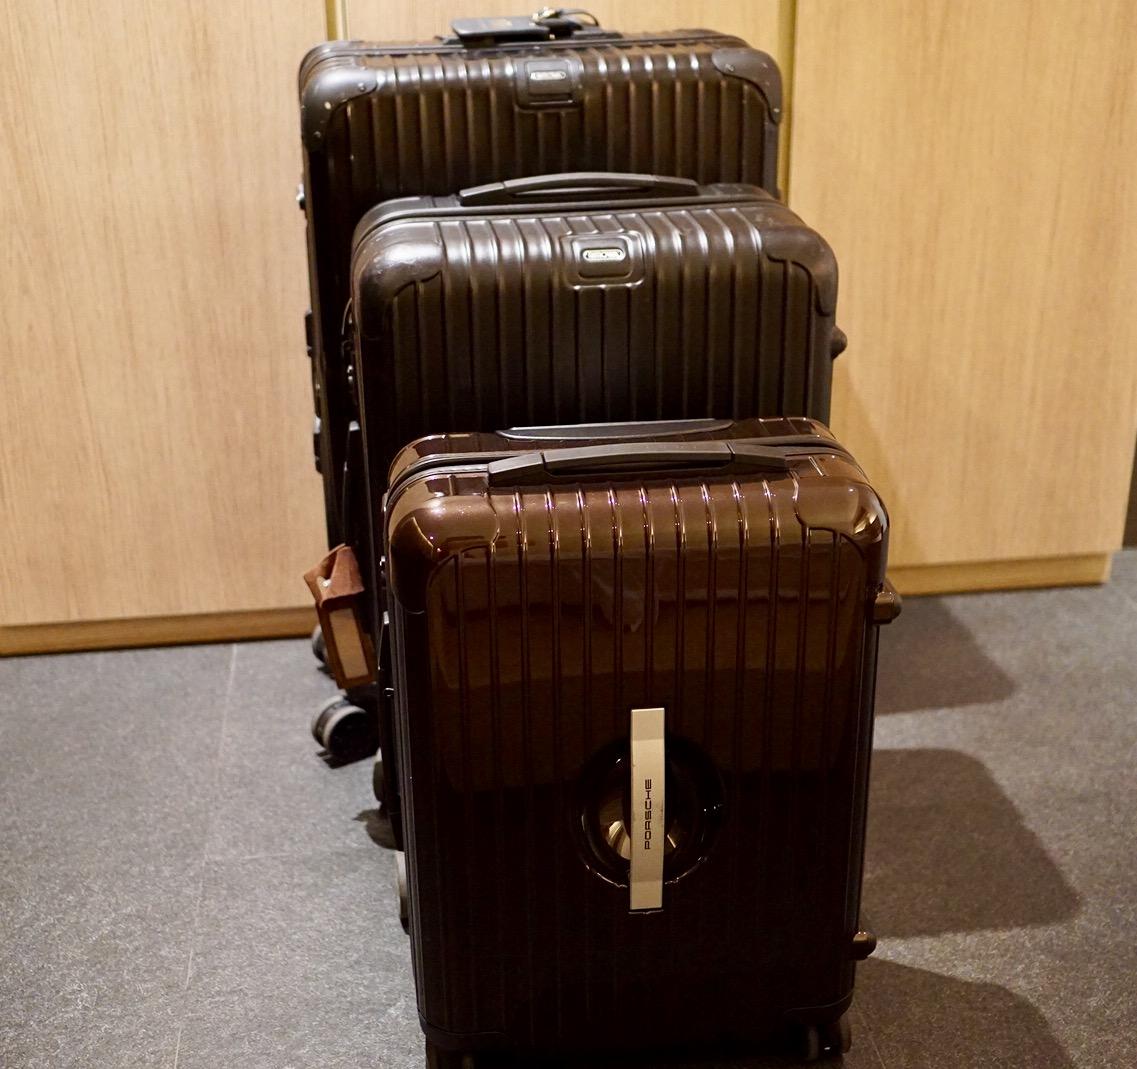 7bd44911b3 リモワ(RIMOWA)の選び方 - 楽しいスーツケース選び -   リーマン ...